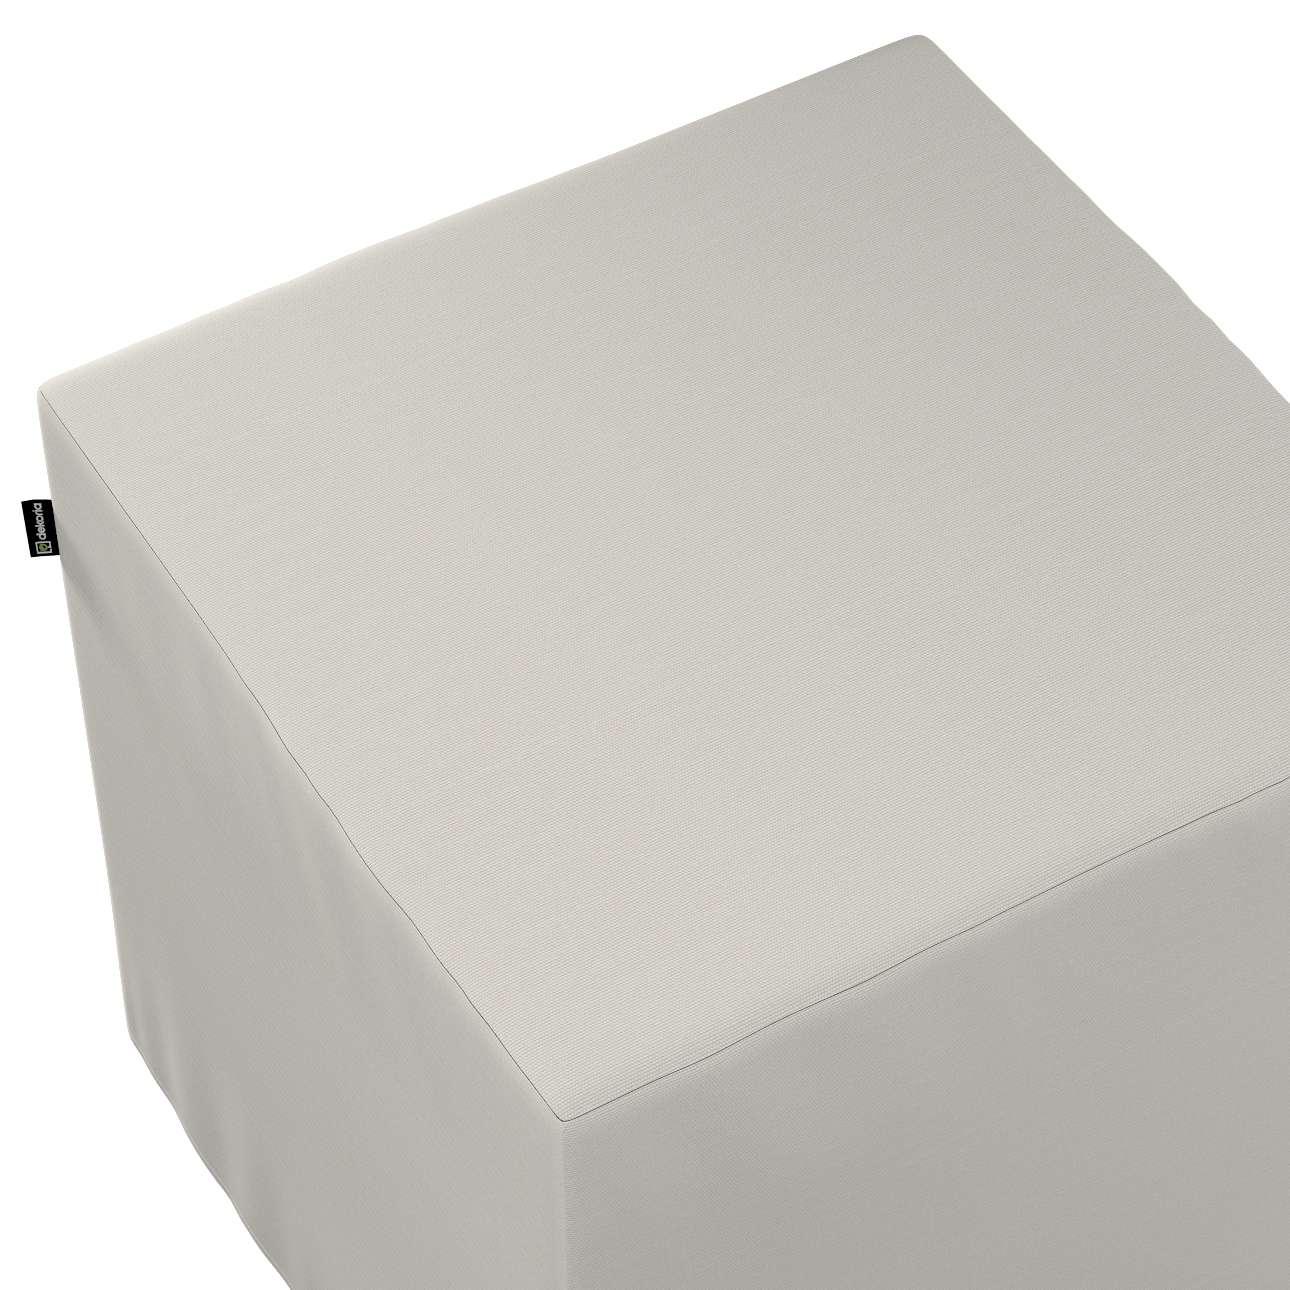 Pufa kostka w kolekcji Cotton Panama, tkanina: 702-31